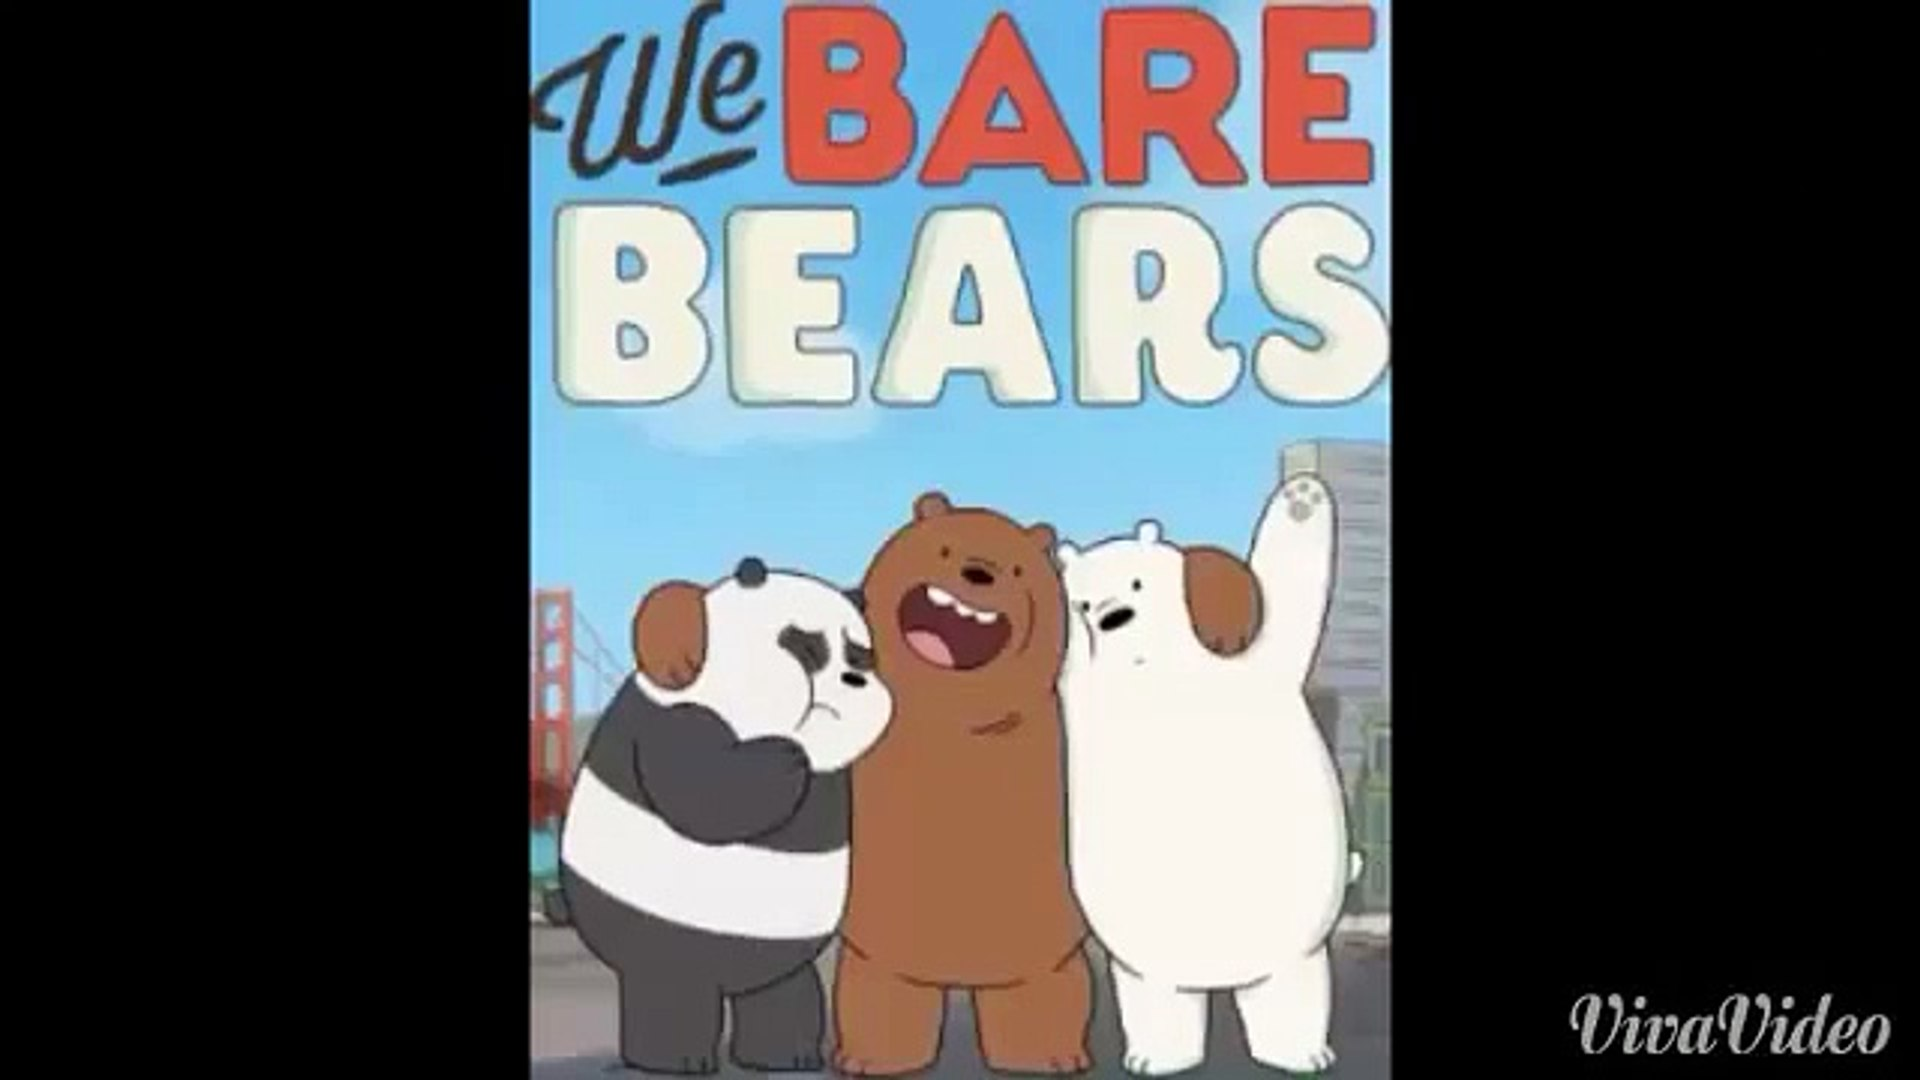 Top 3# favorite cartoon shows